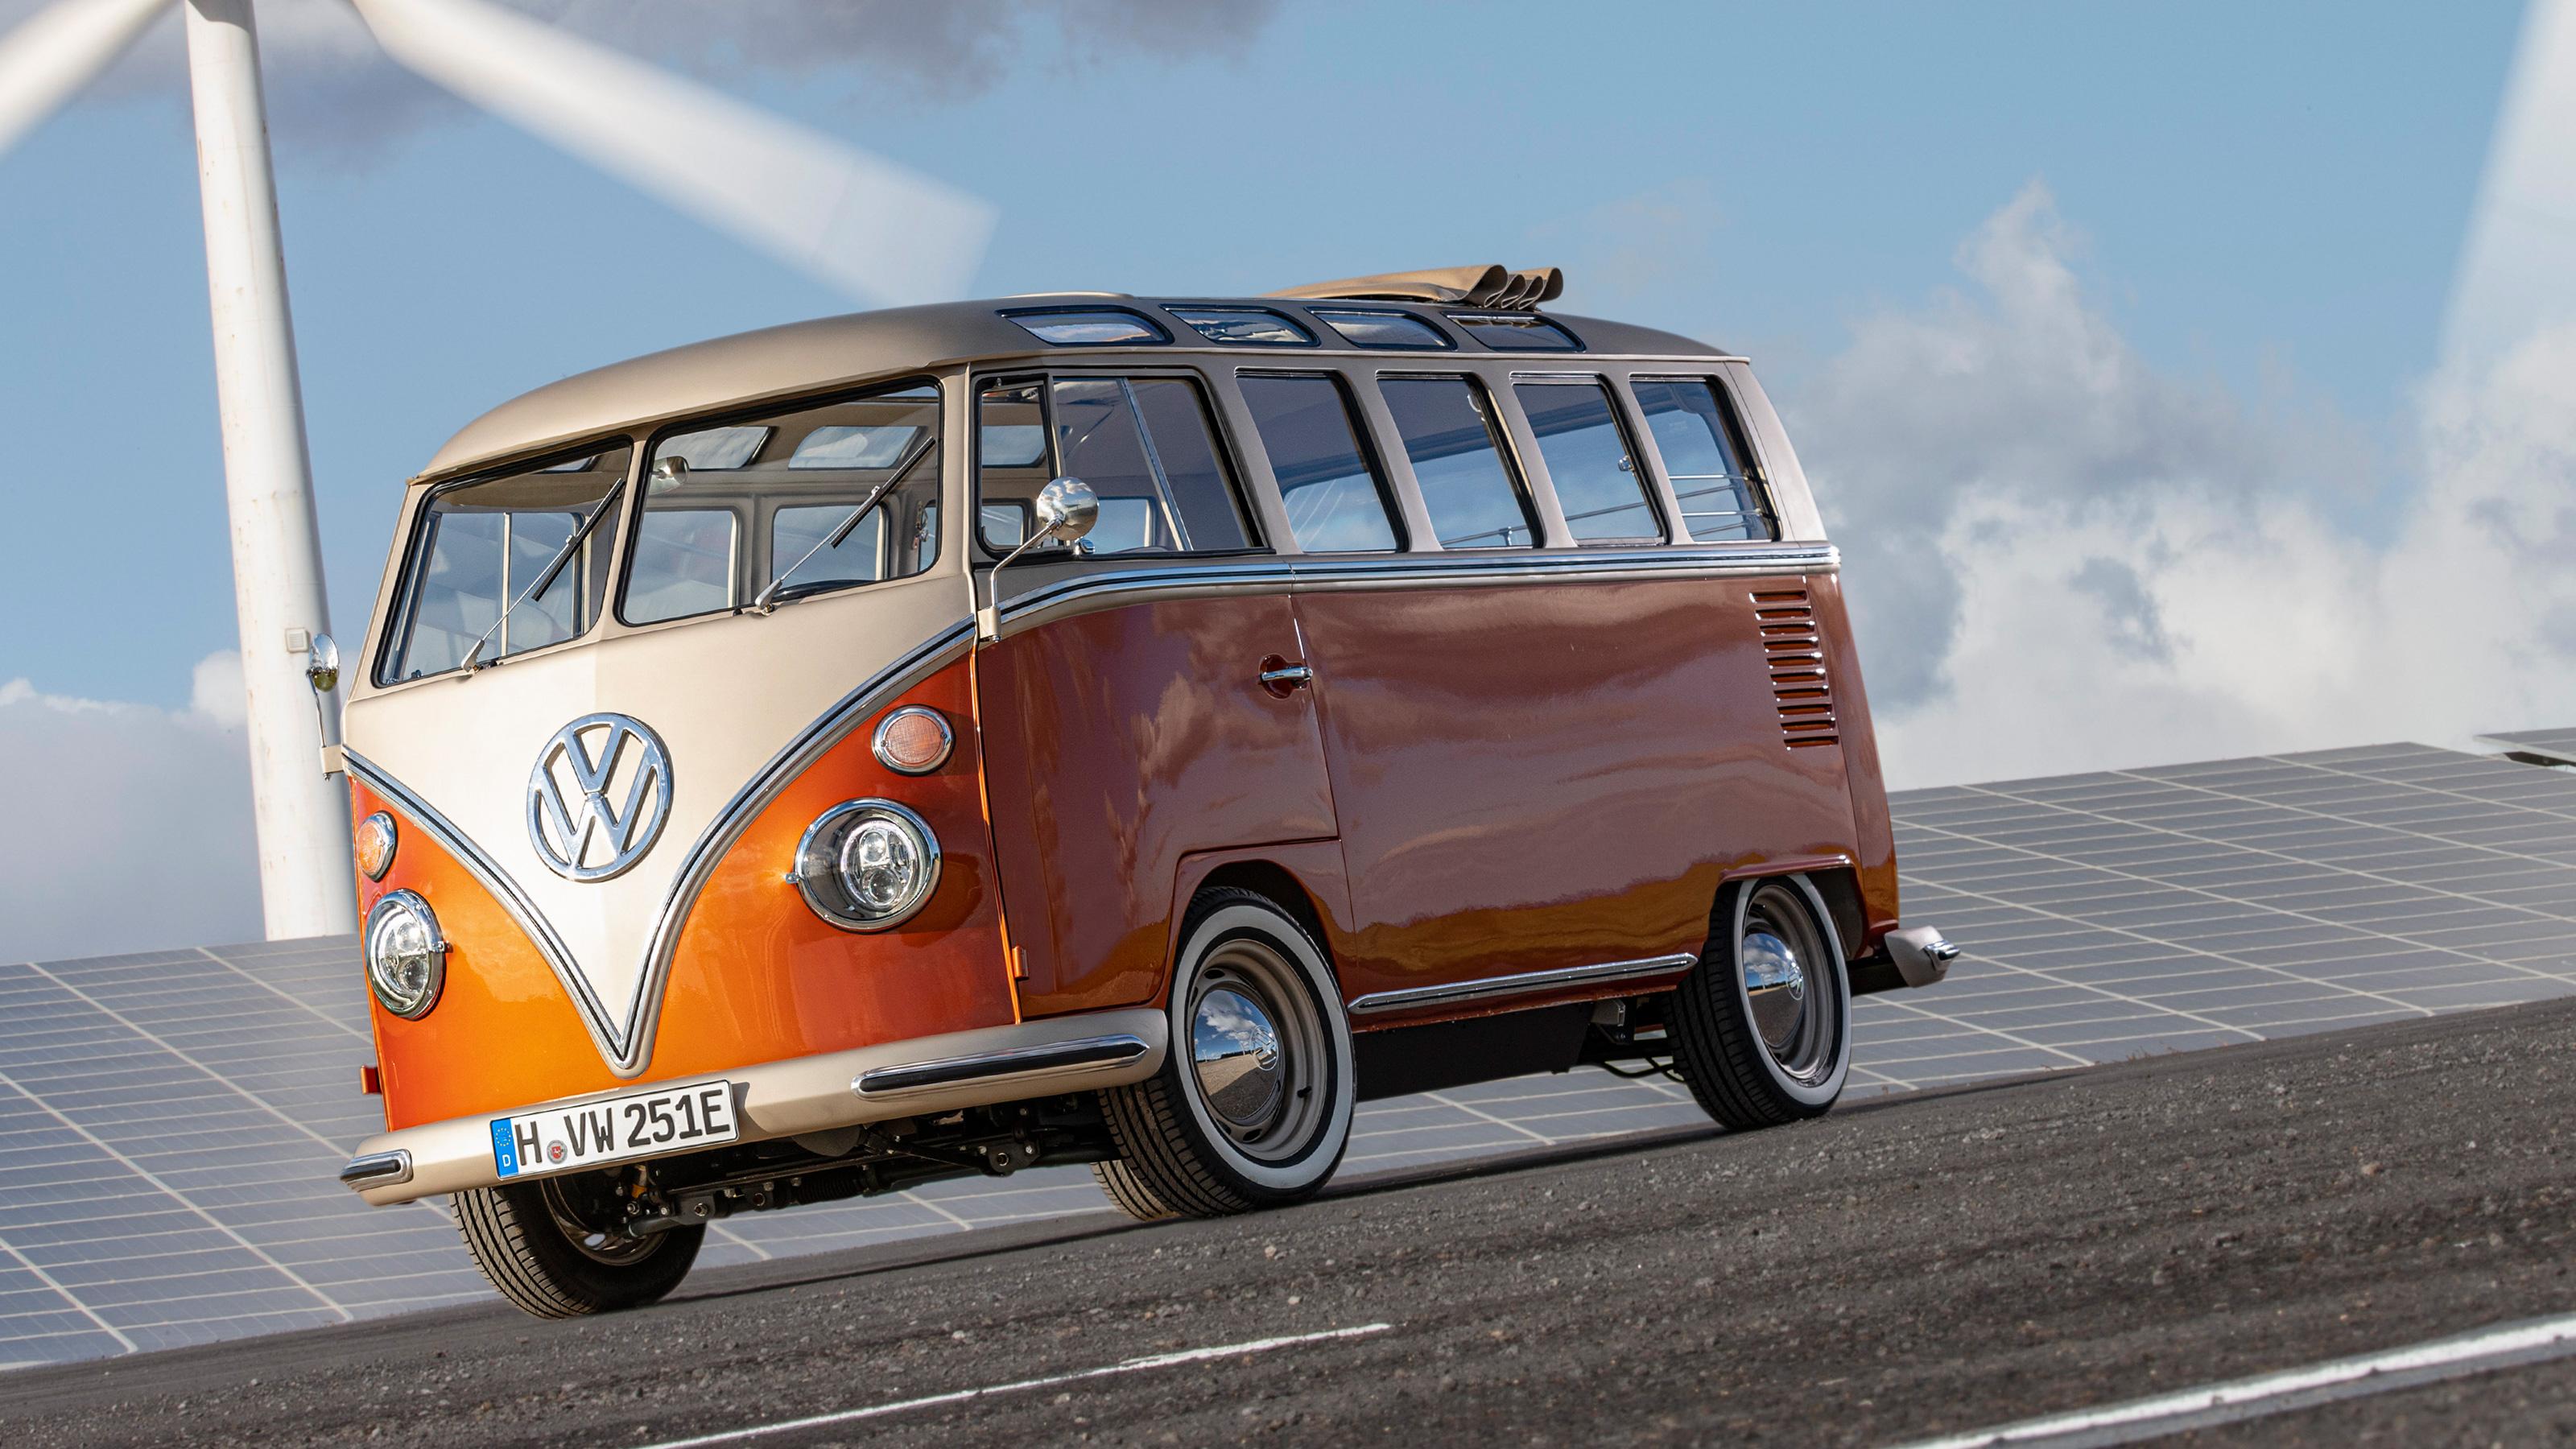 New Volkswagen E Bulli Electric Camper Van Revealed Auto Express